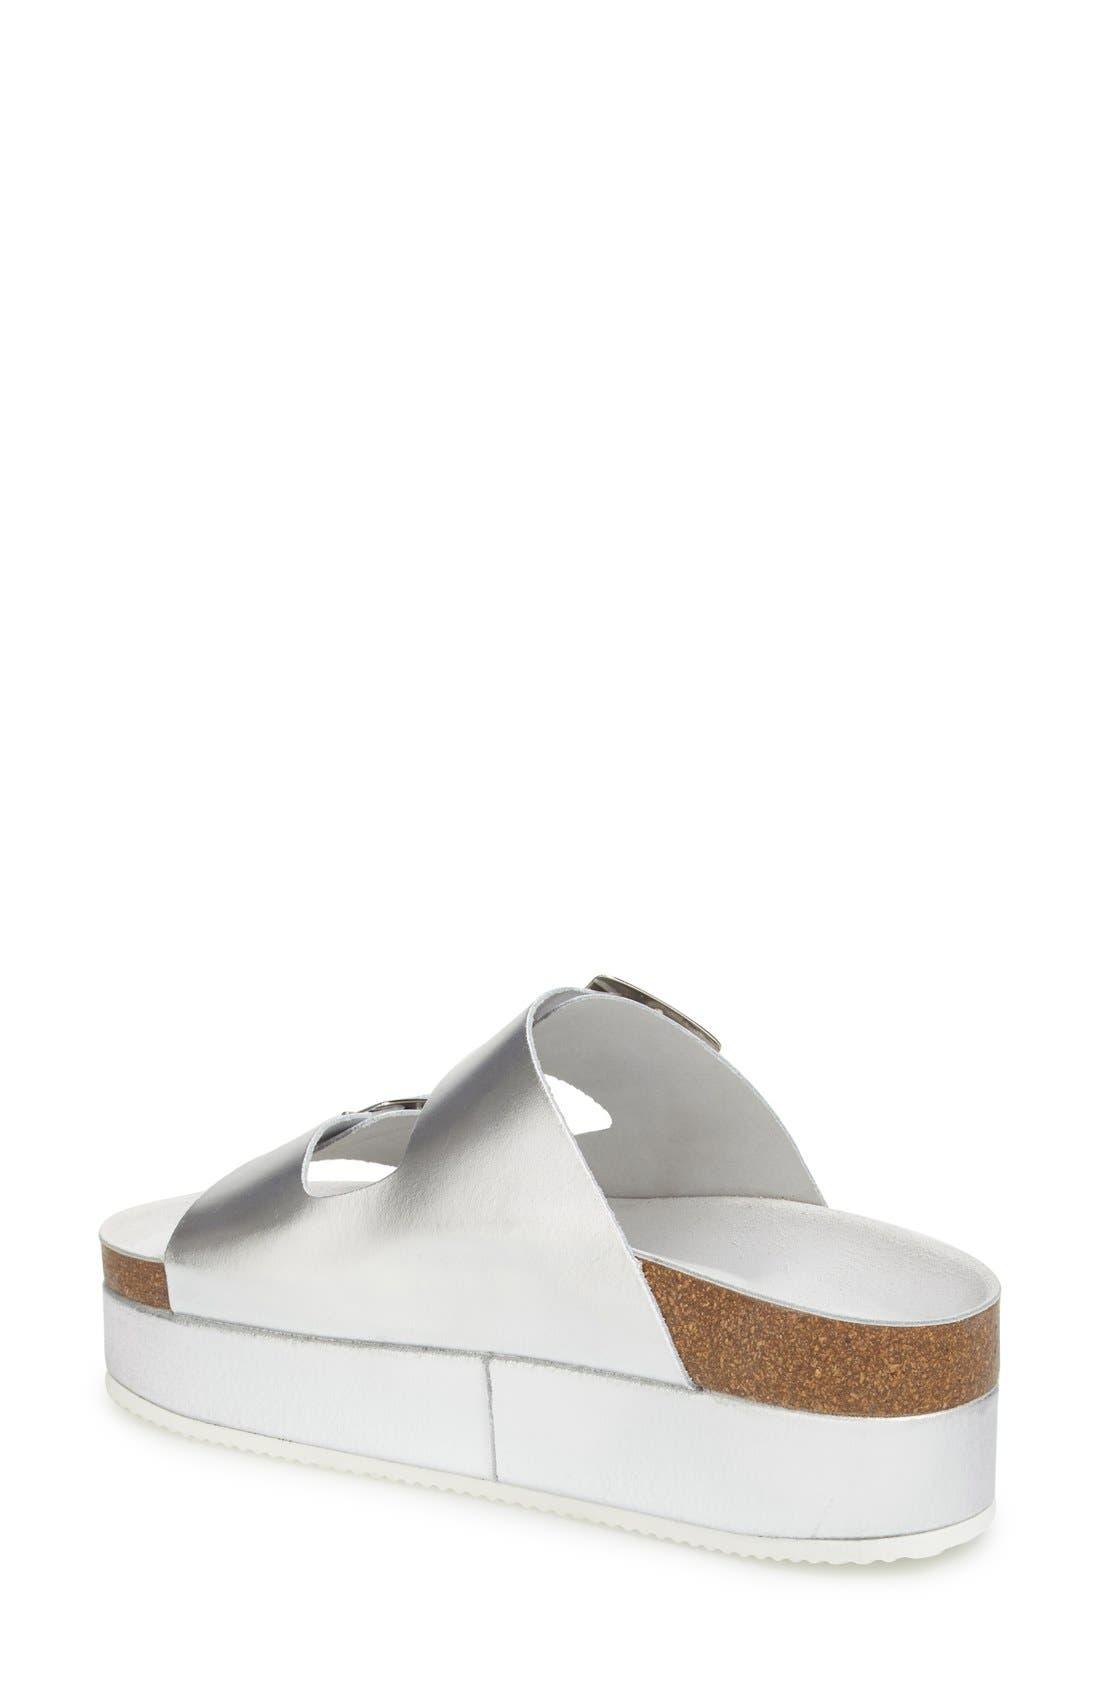 'Fang' Platform Sandal,                             Alternate thumbnail 2, color,                             Silver Multi